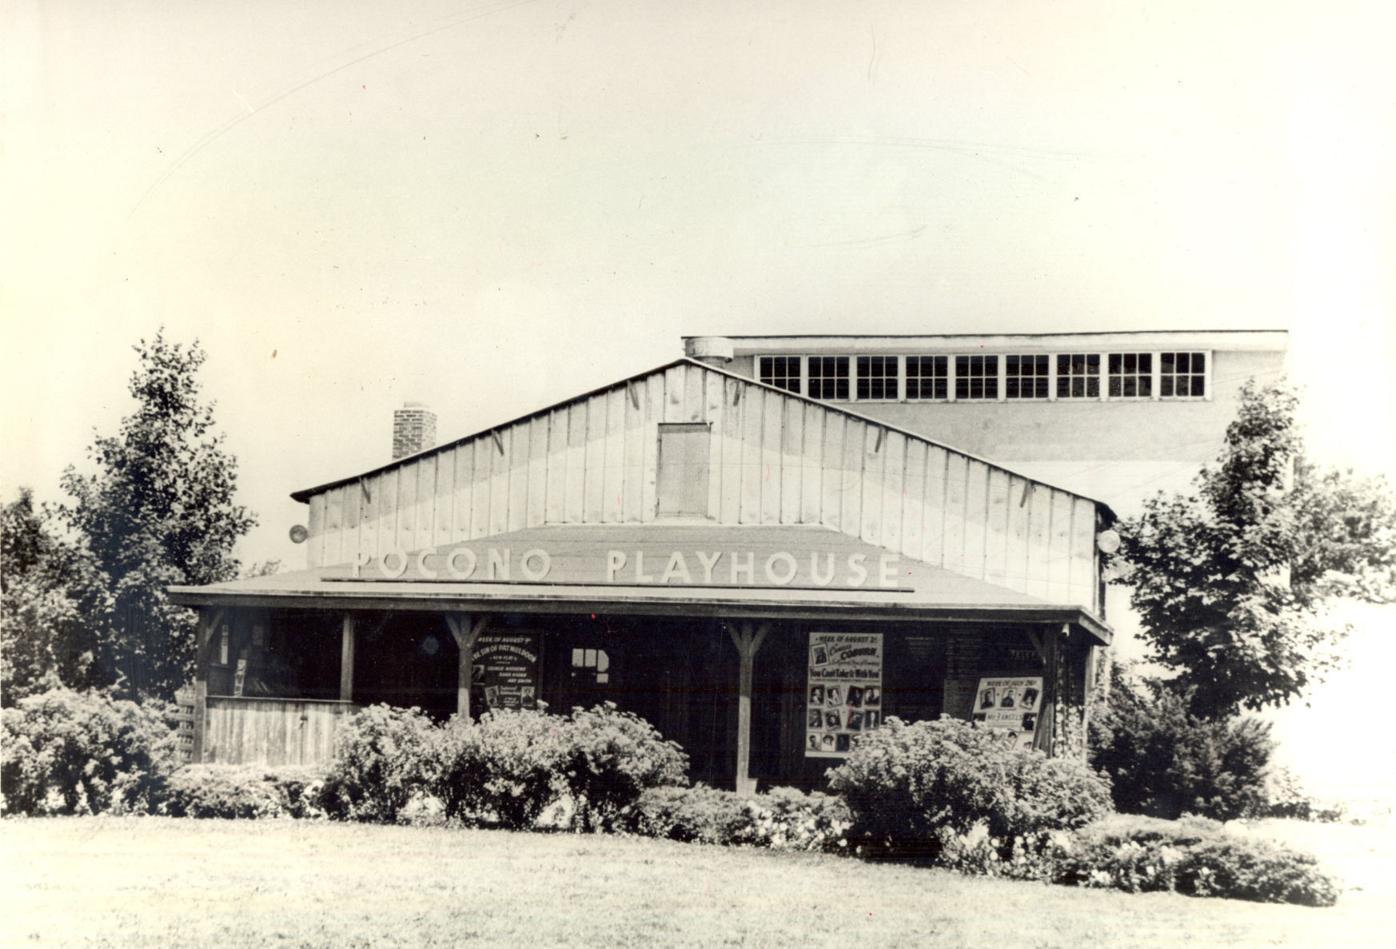 Pocono Playhouse